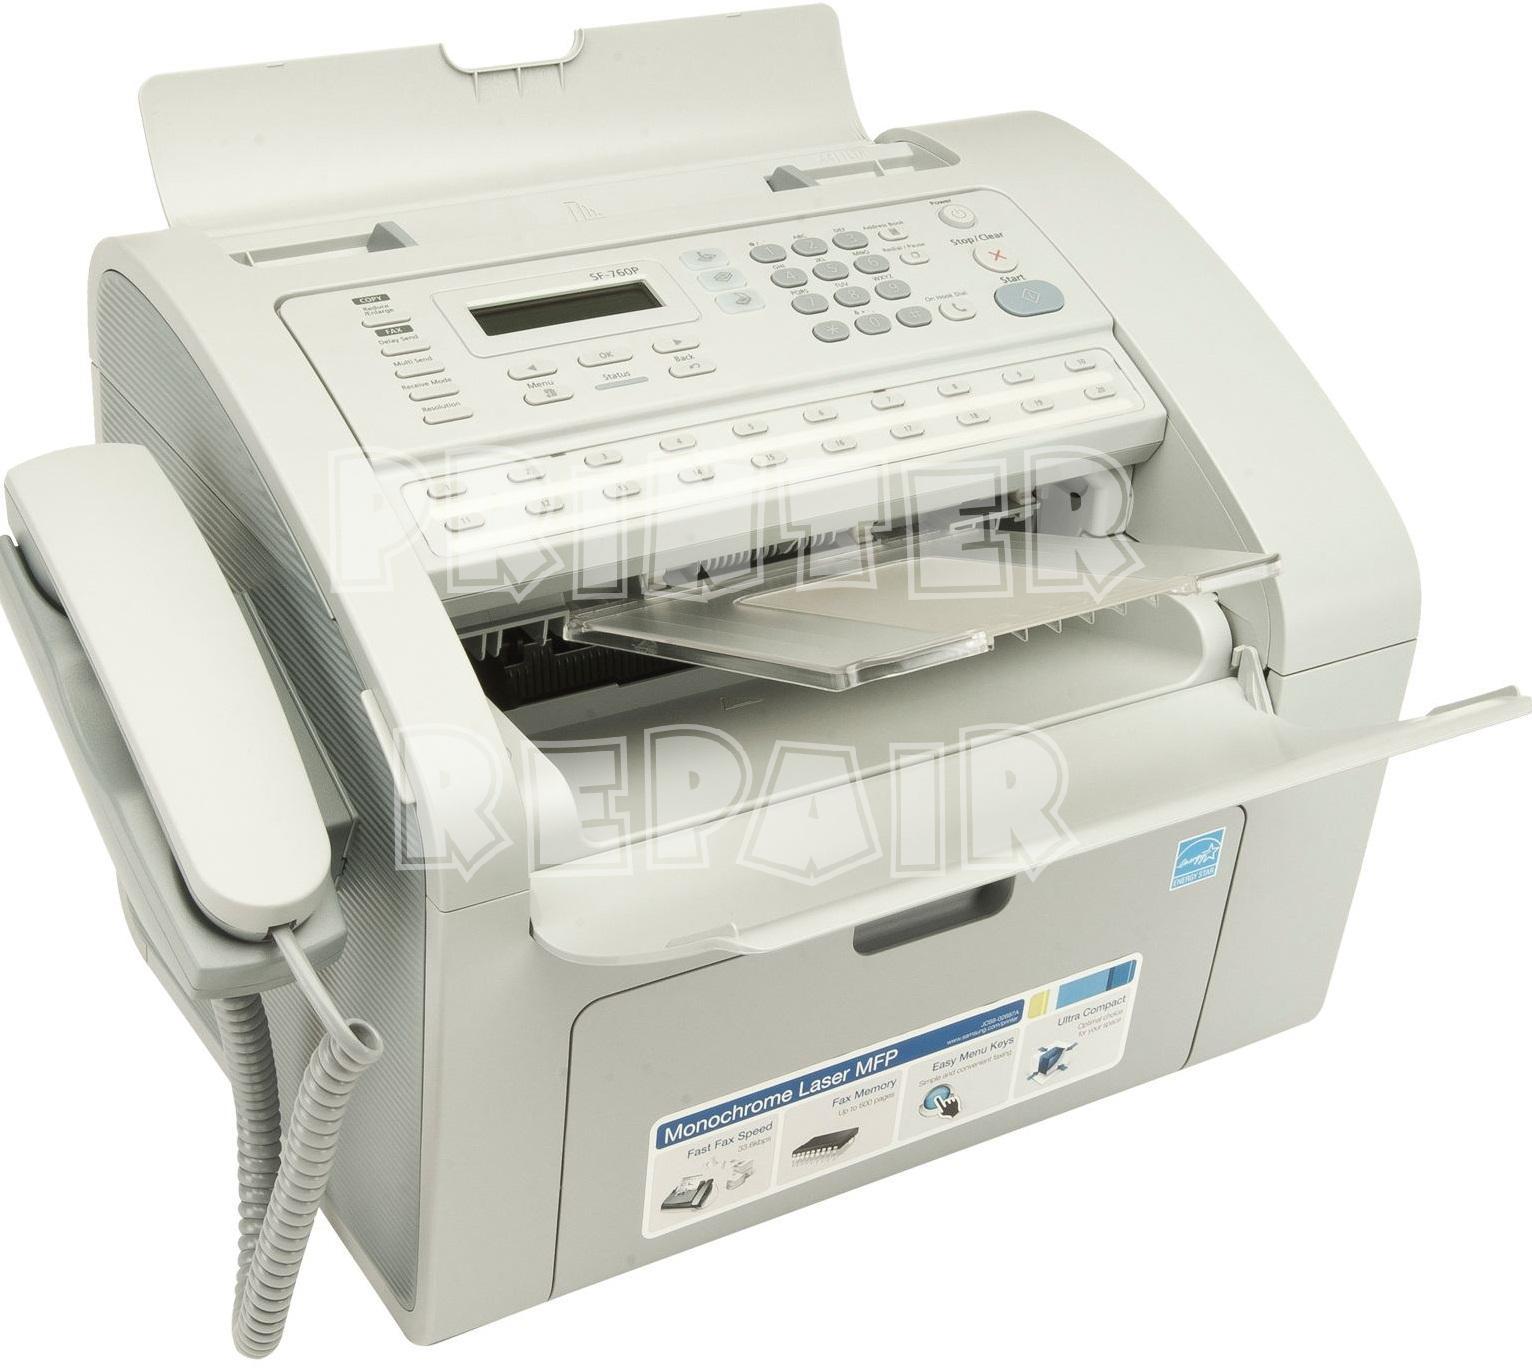 Samsung SF 5100I